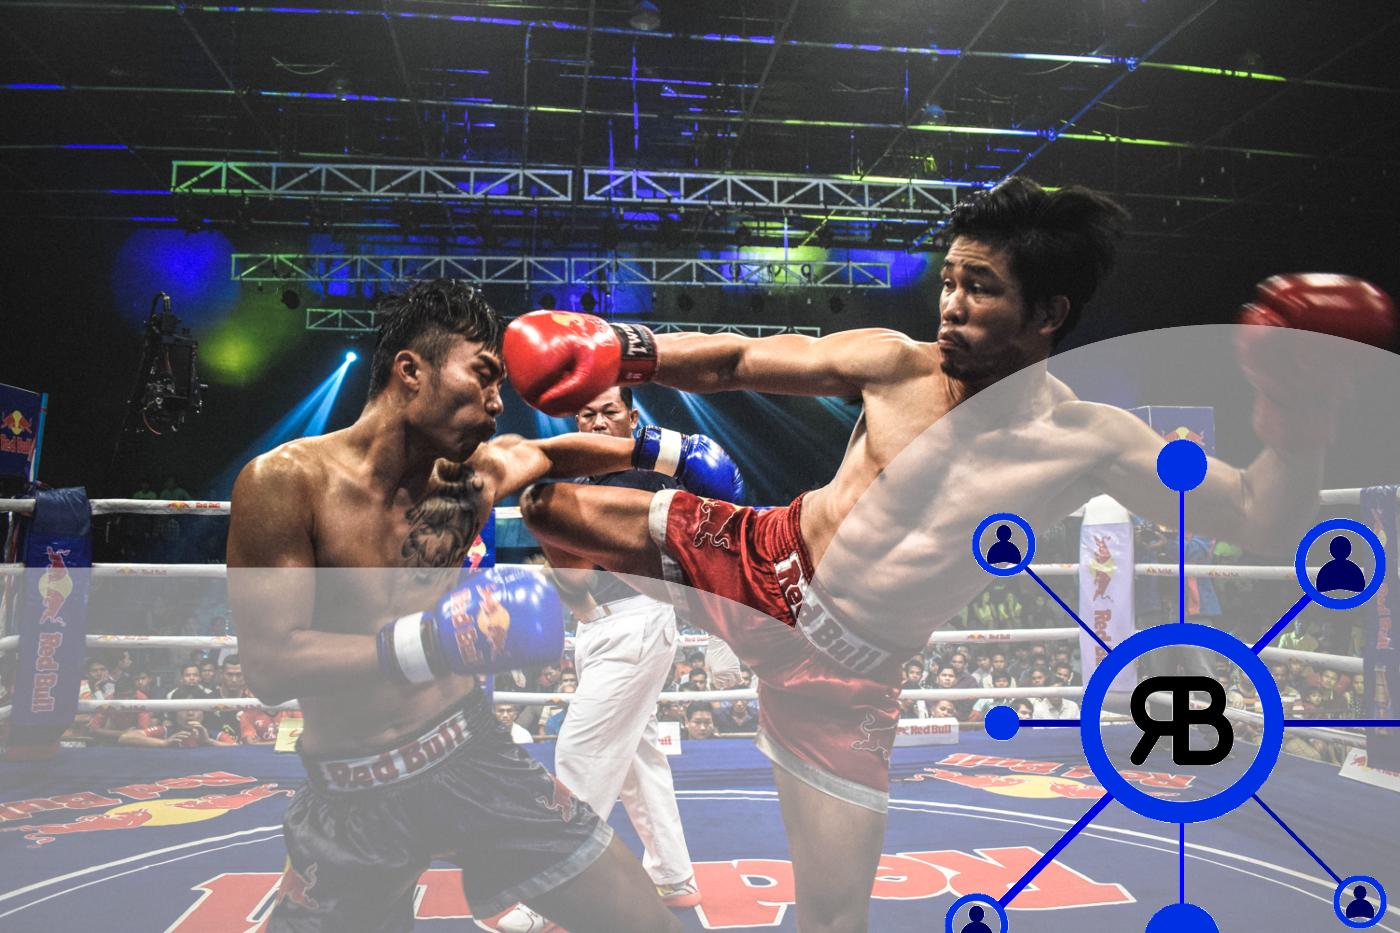 combat-boxe-Google-Bing